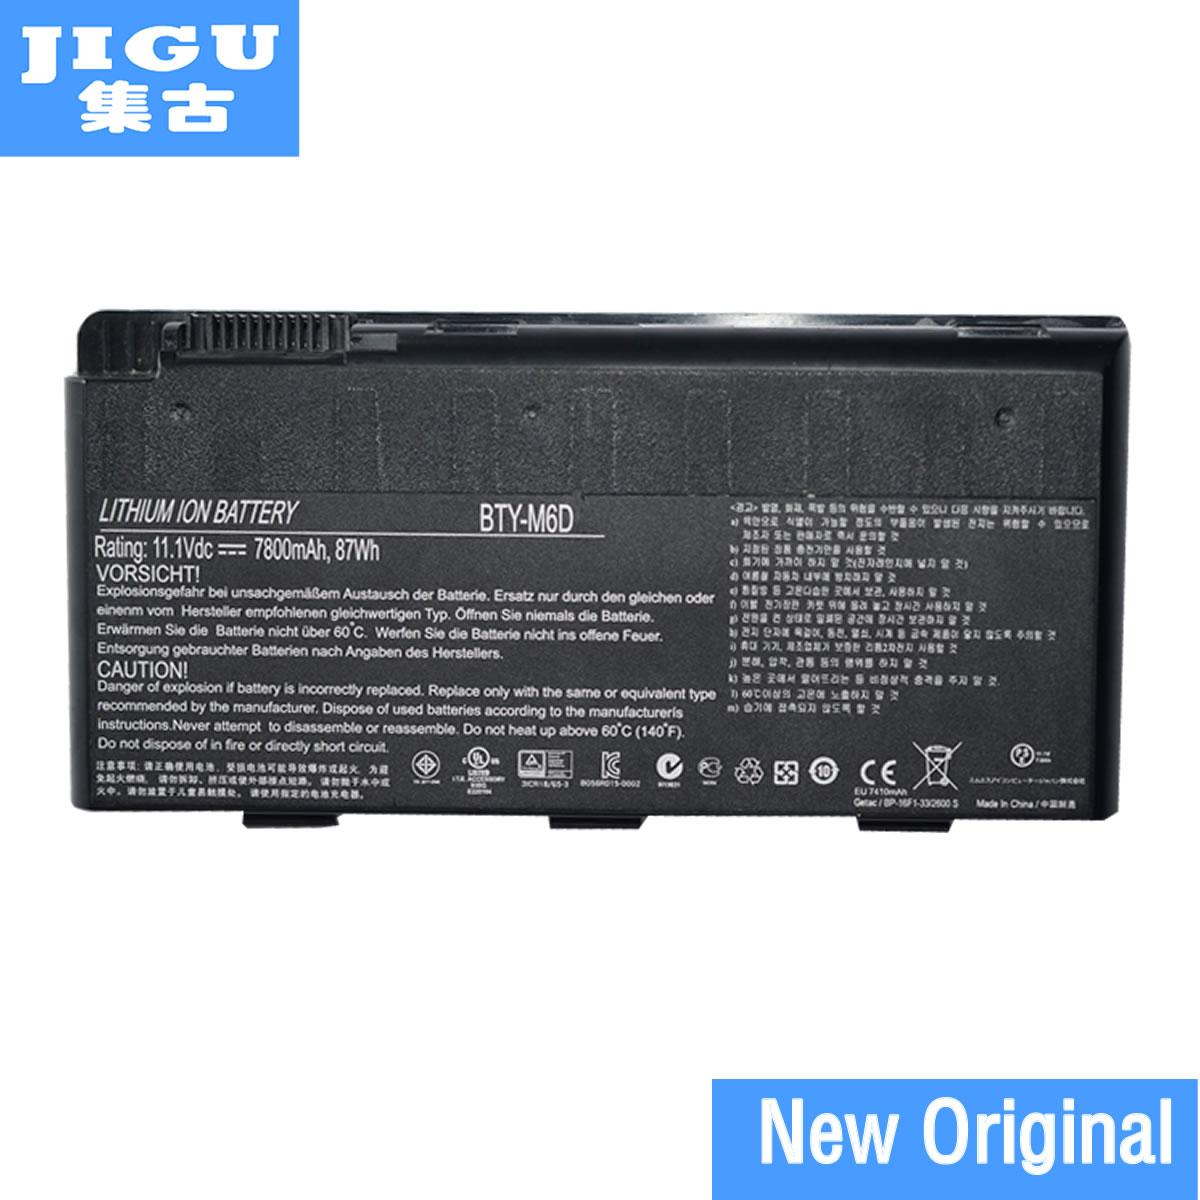 цена на JIGU ORIGNAL Laptop Battery BTY-GS70 BTY-M6D FOR MSI 1762 1763 17631 CR720 E6603 GS70 GX70 GT60 GT660 GT660R GT663 GT670 GT680